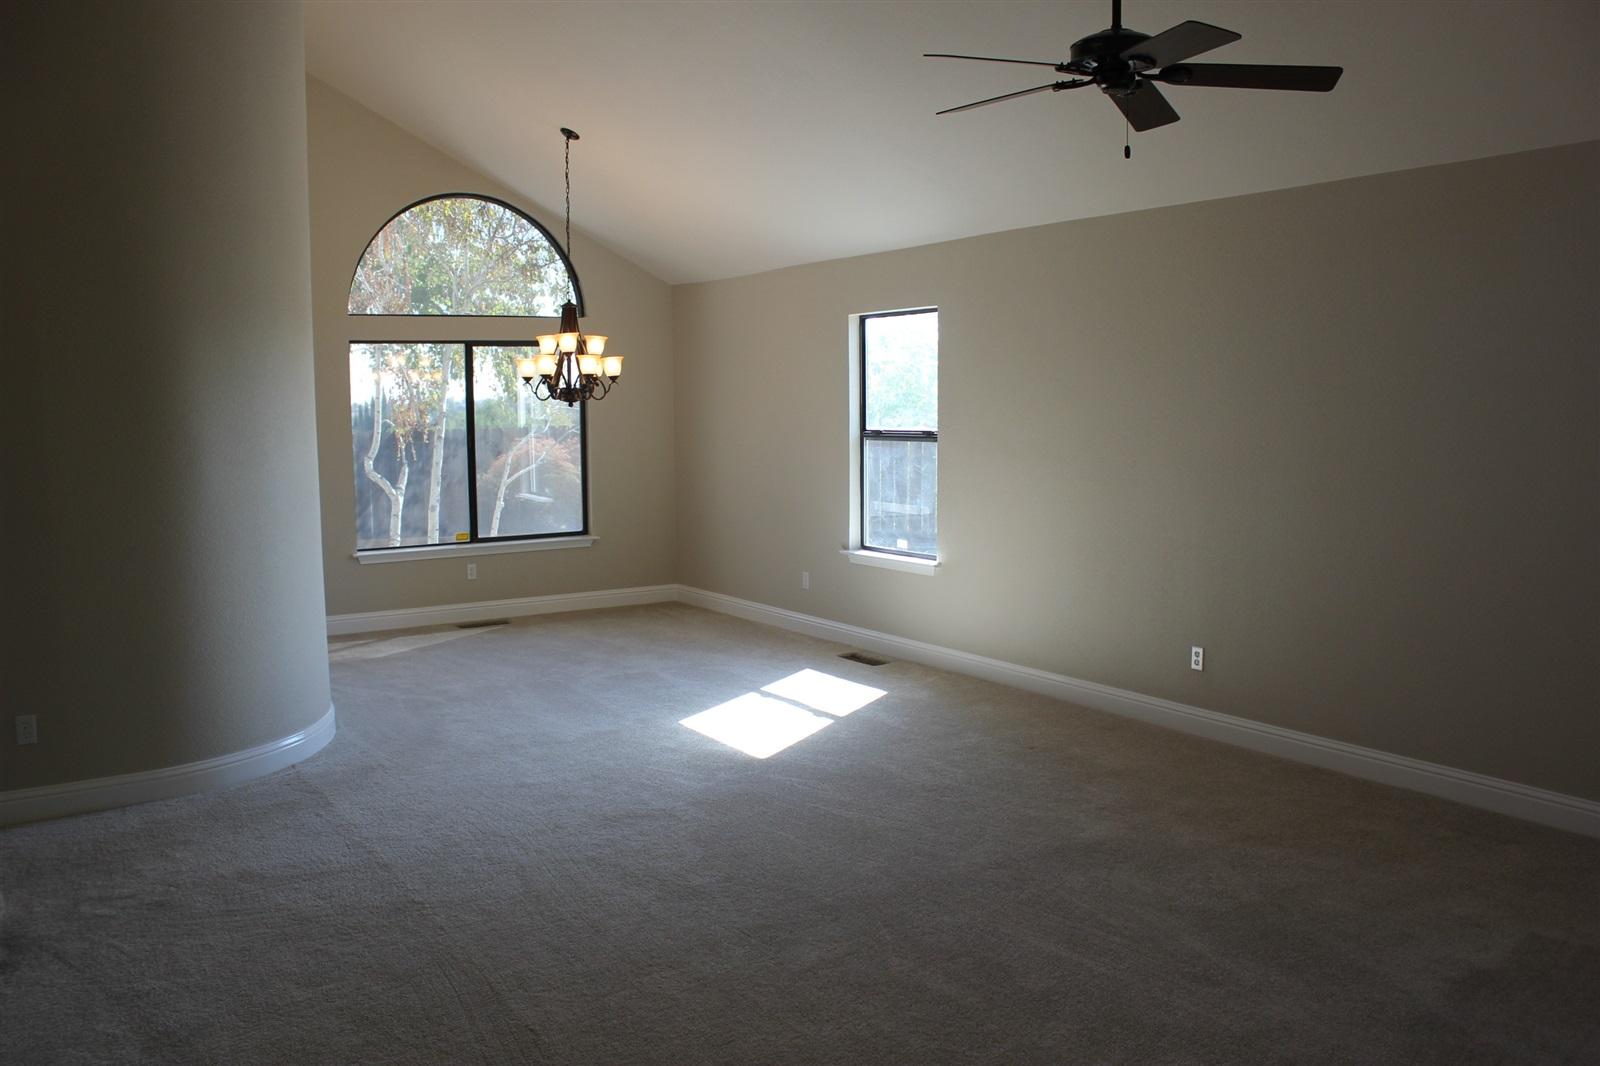 405 Ridgewood Court, Antioch, CA 94509